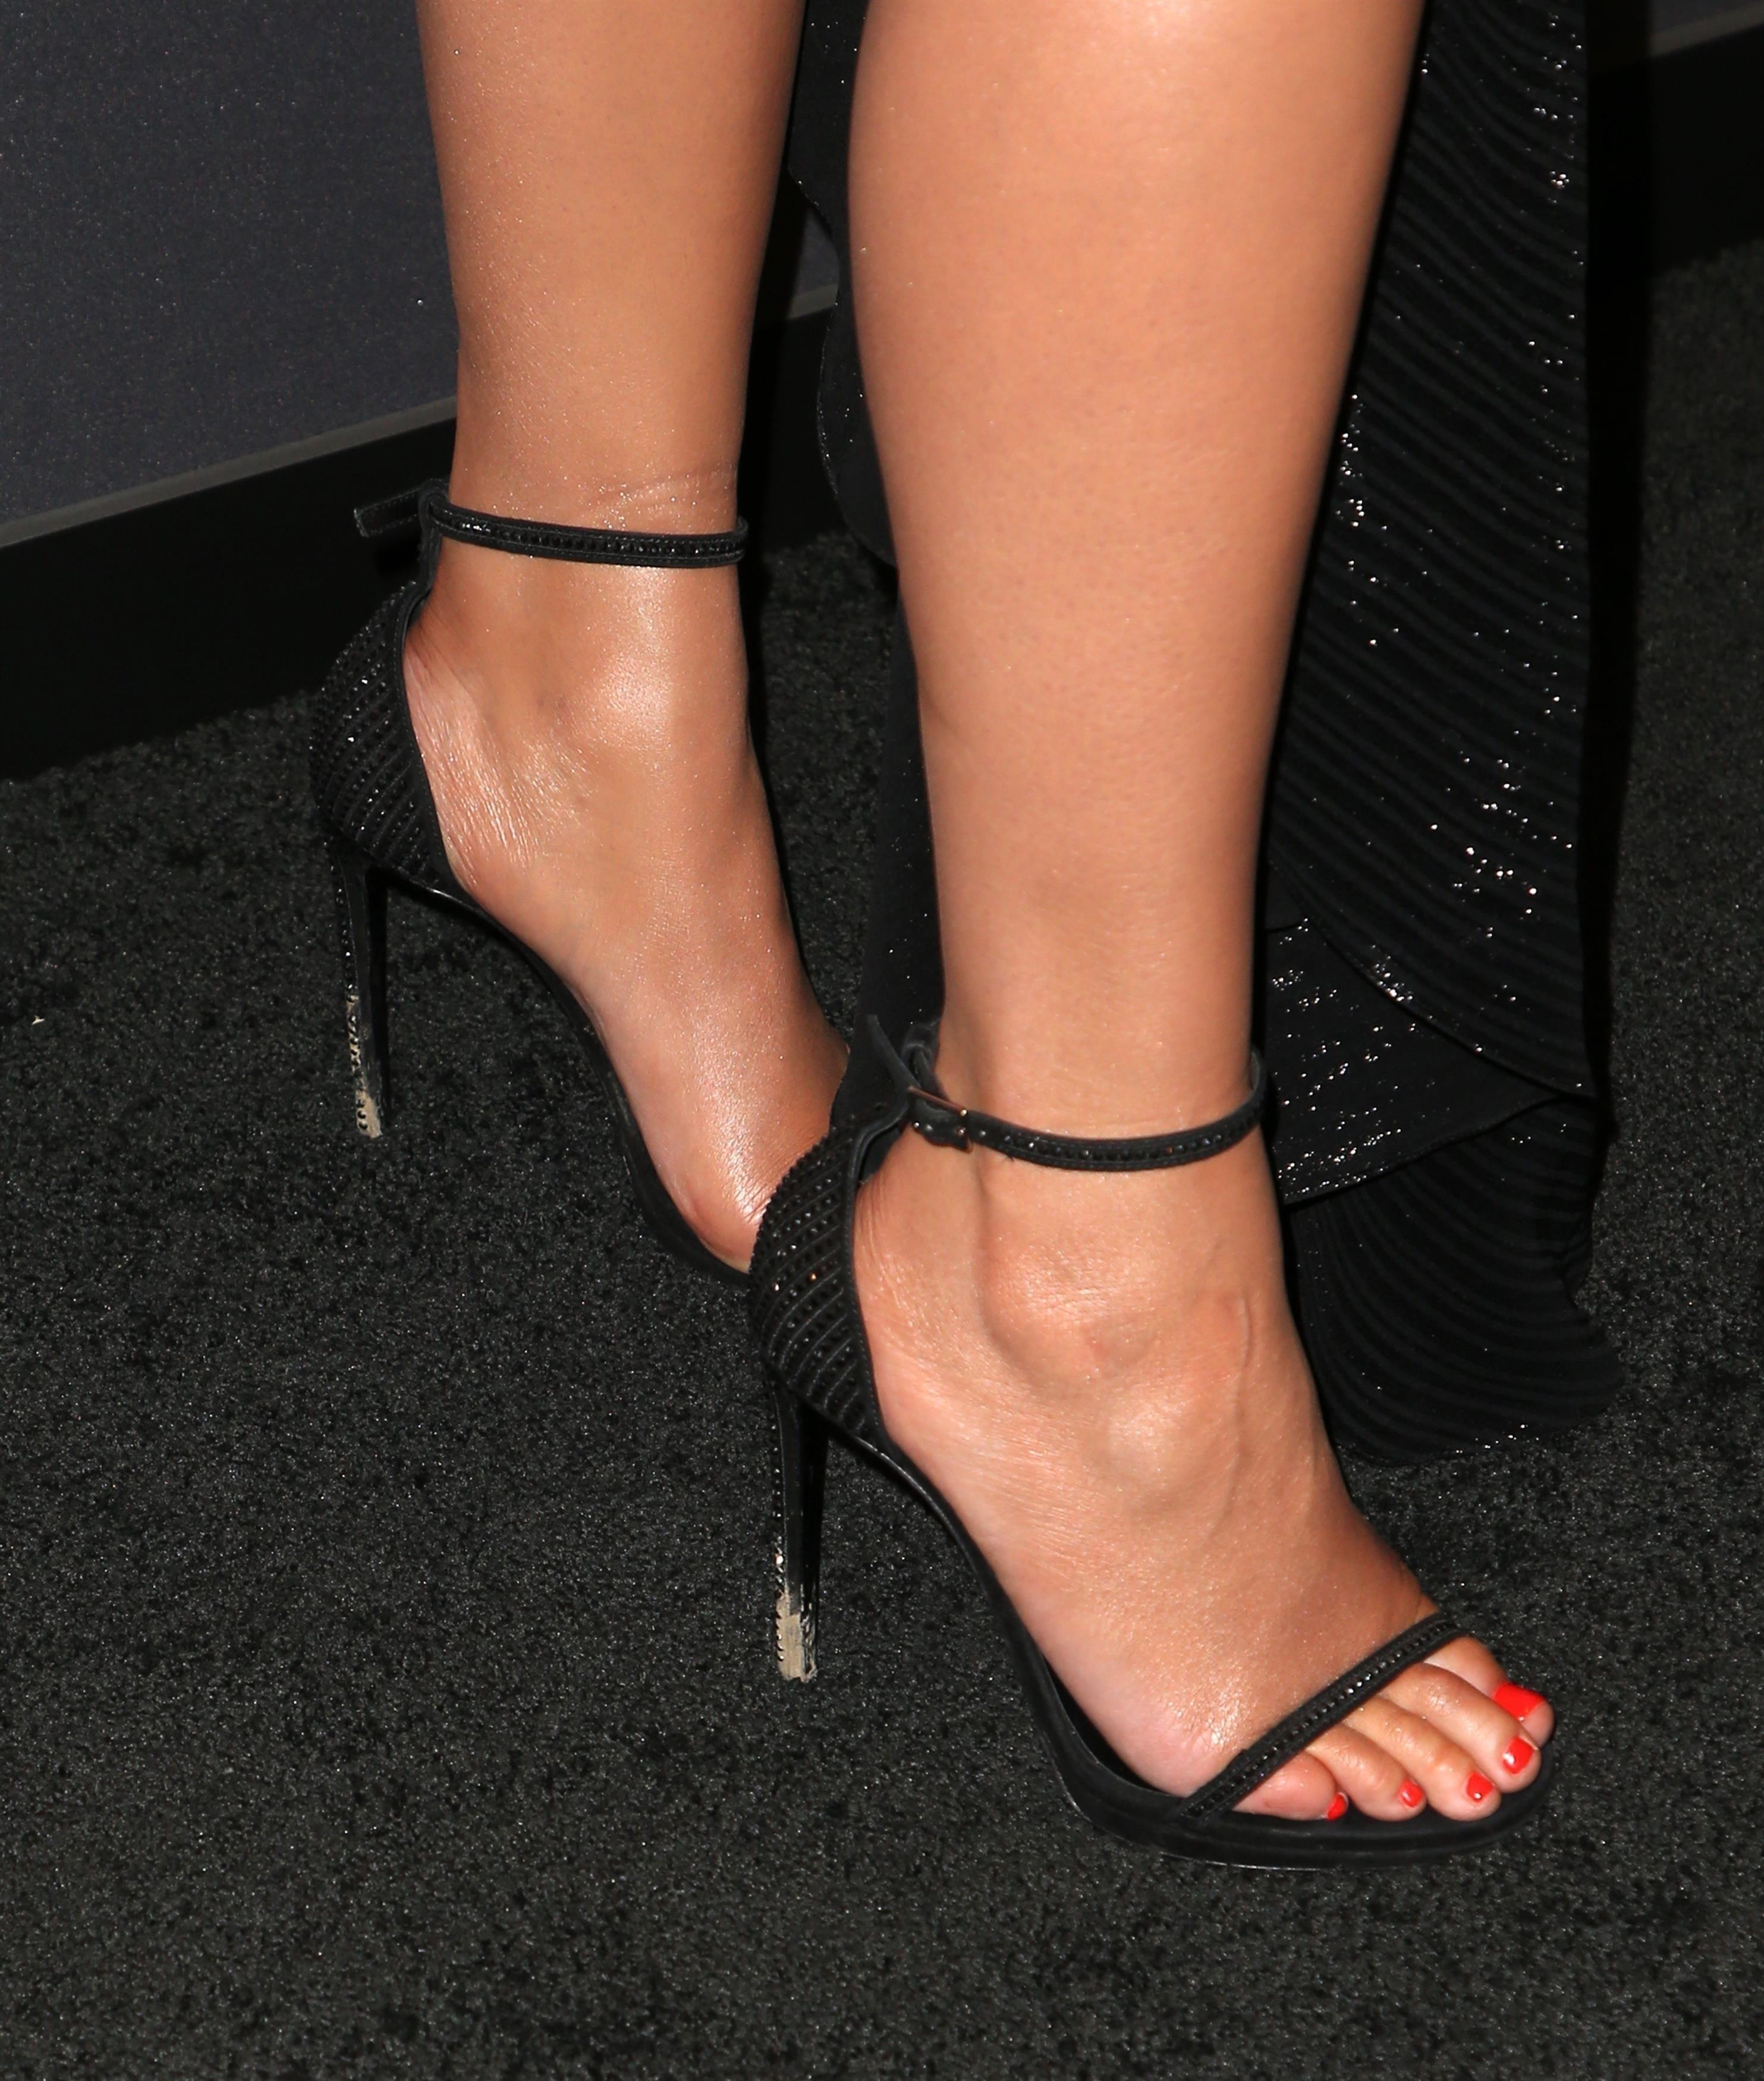 Feet Christine Teigen nude (25 photos), Tits, Paparazzi, Feet, cleavage 2018